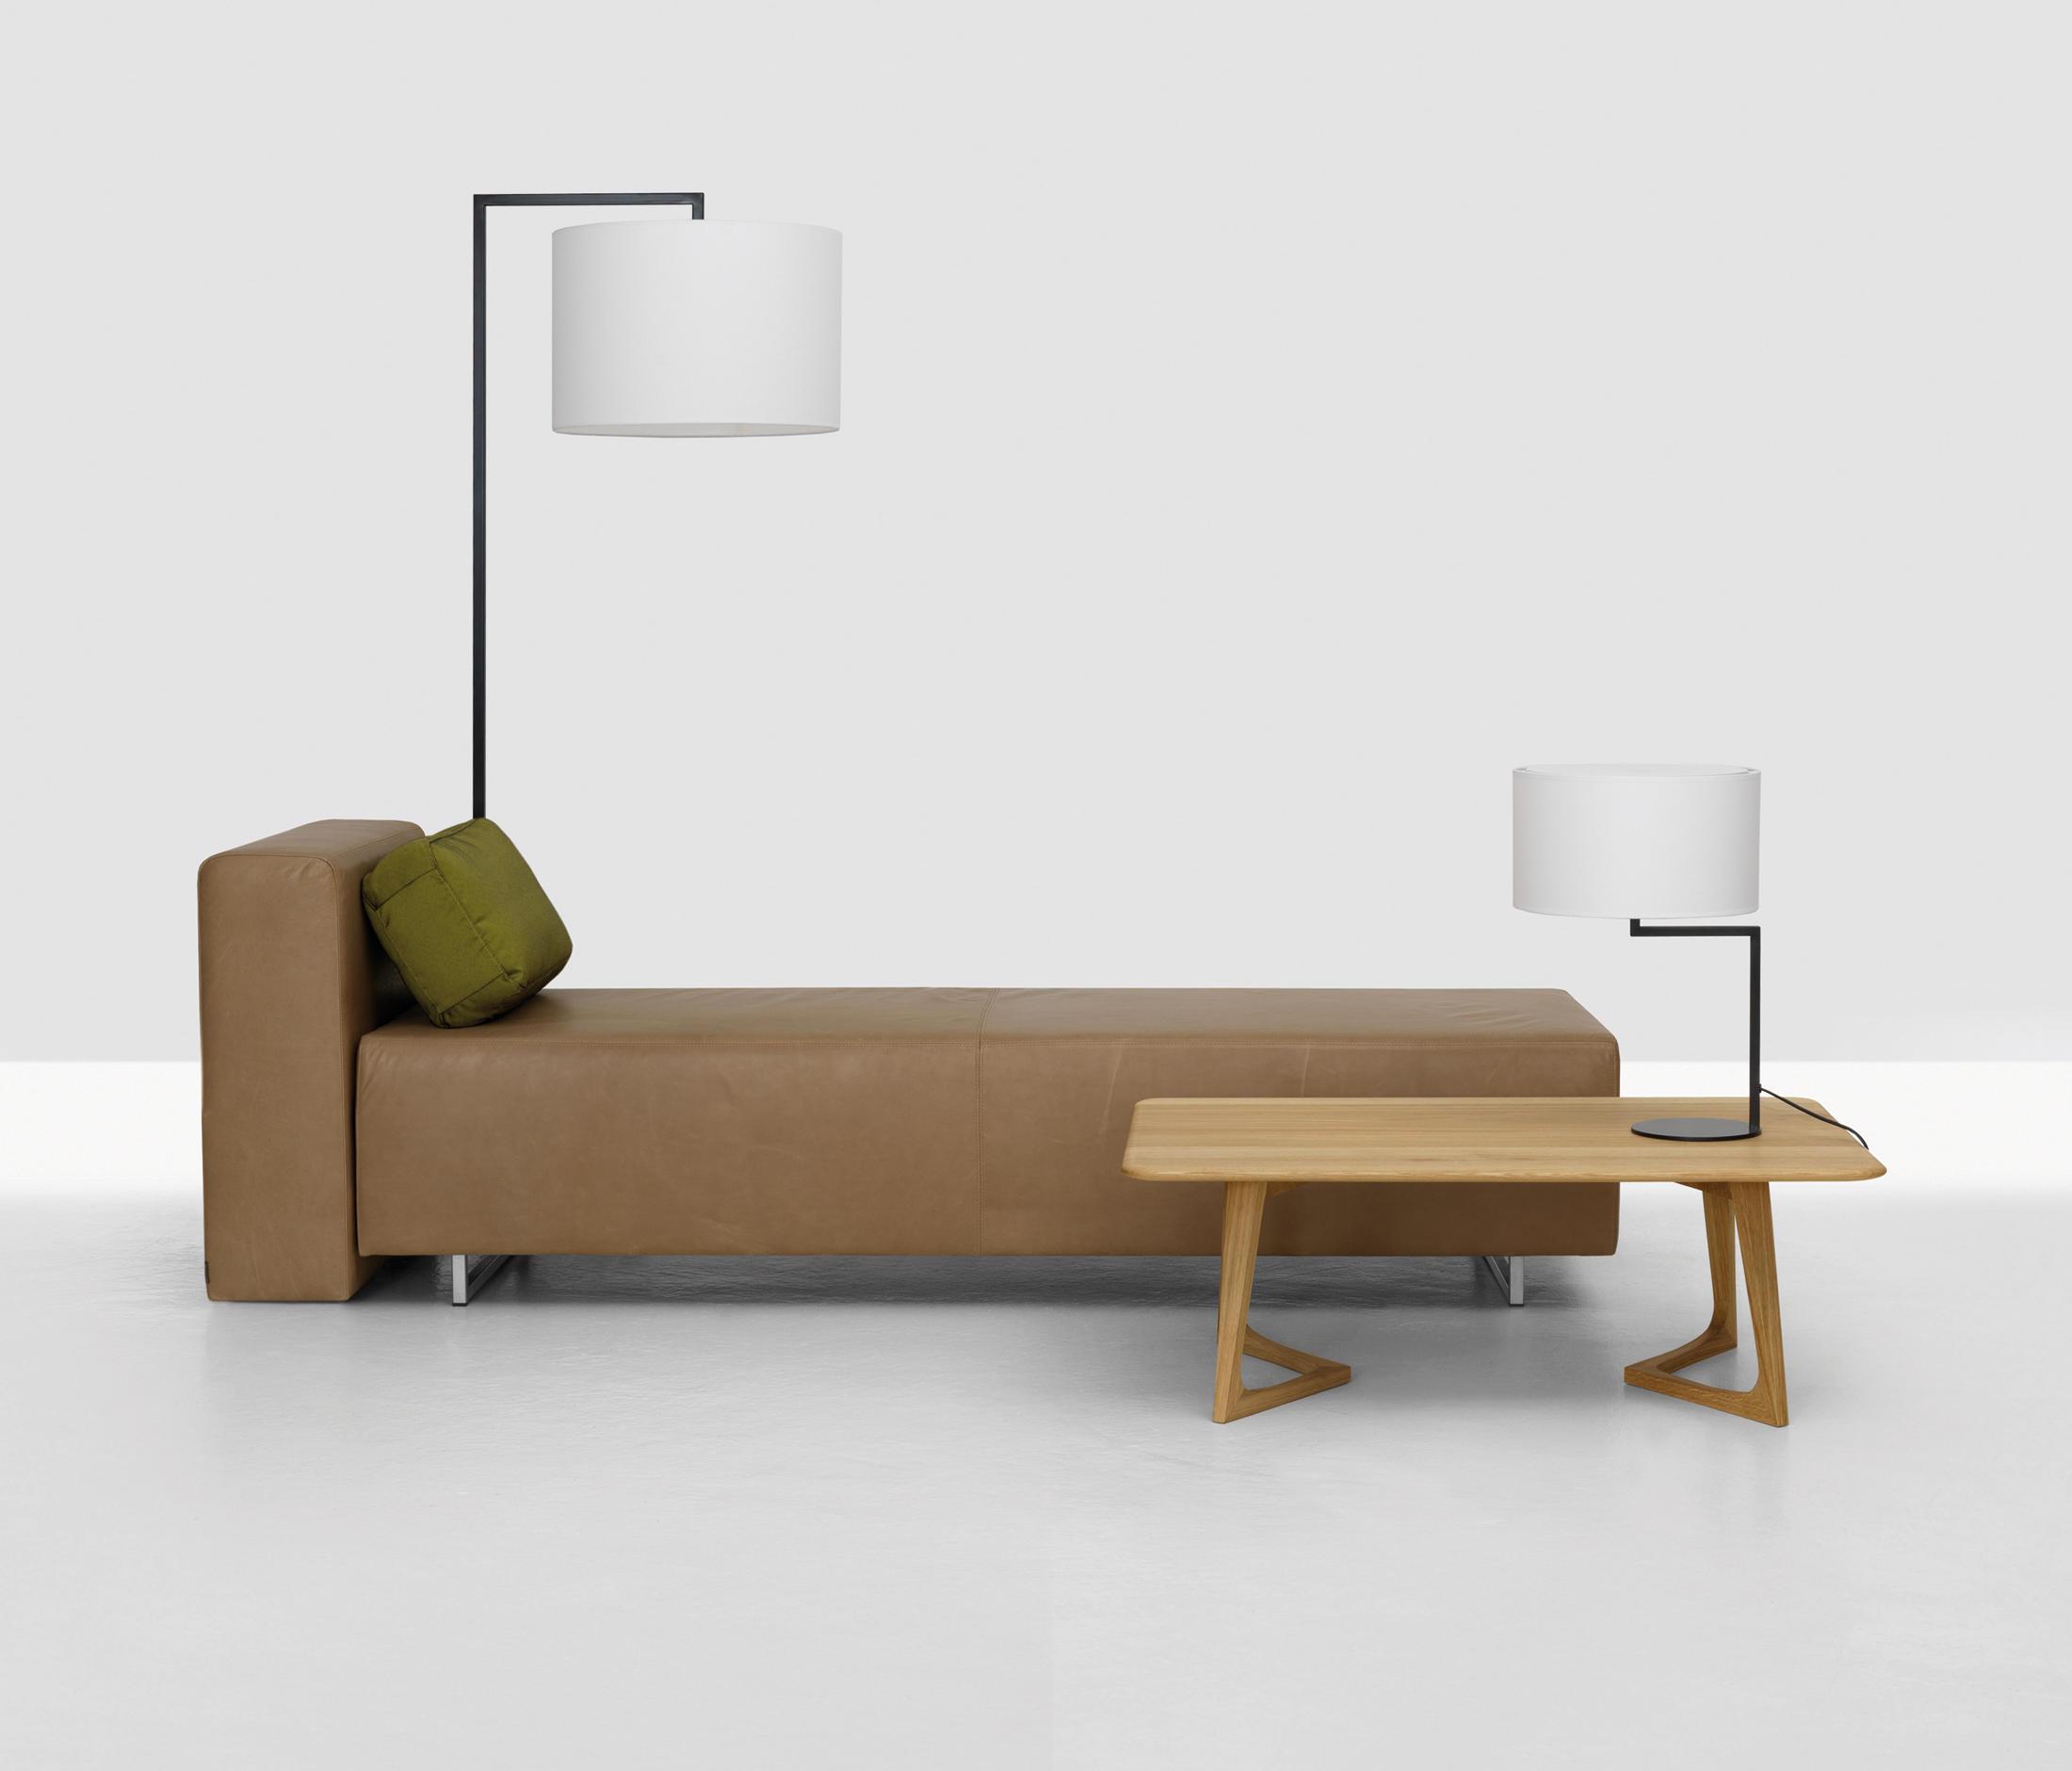 Twist Couch By Zeitraum Twist Couch By Zeitraum